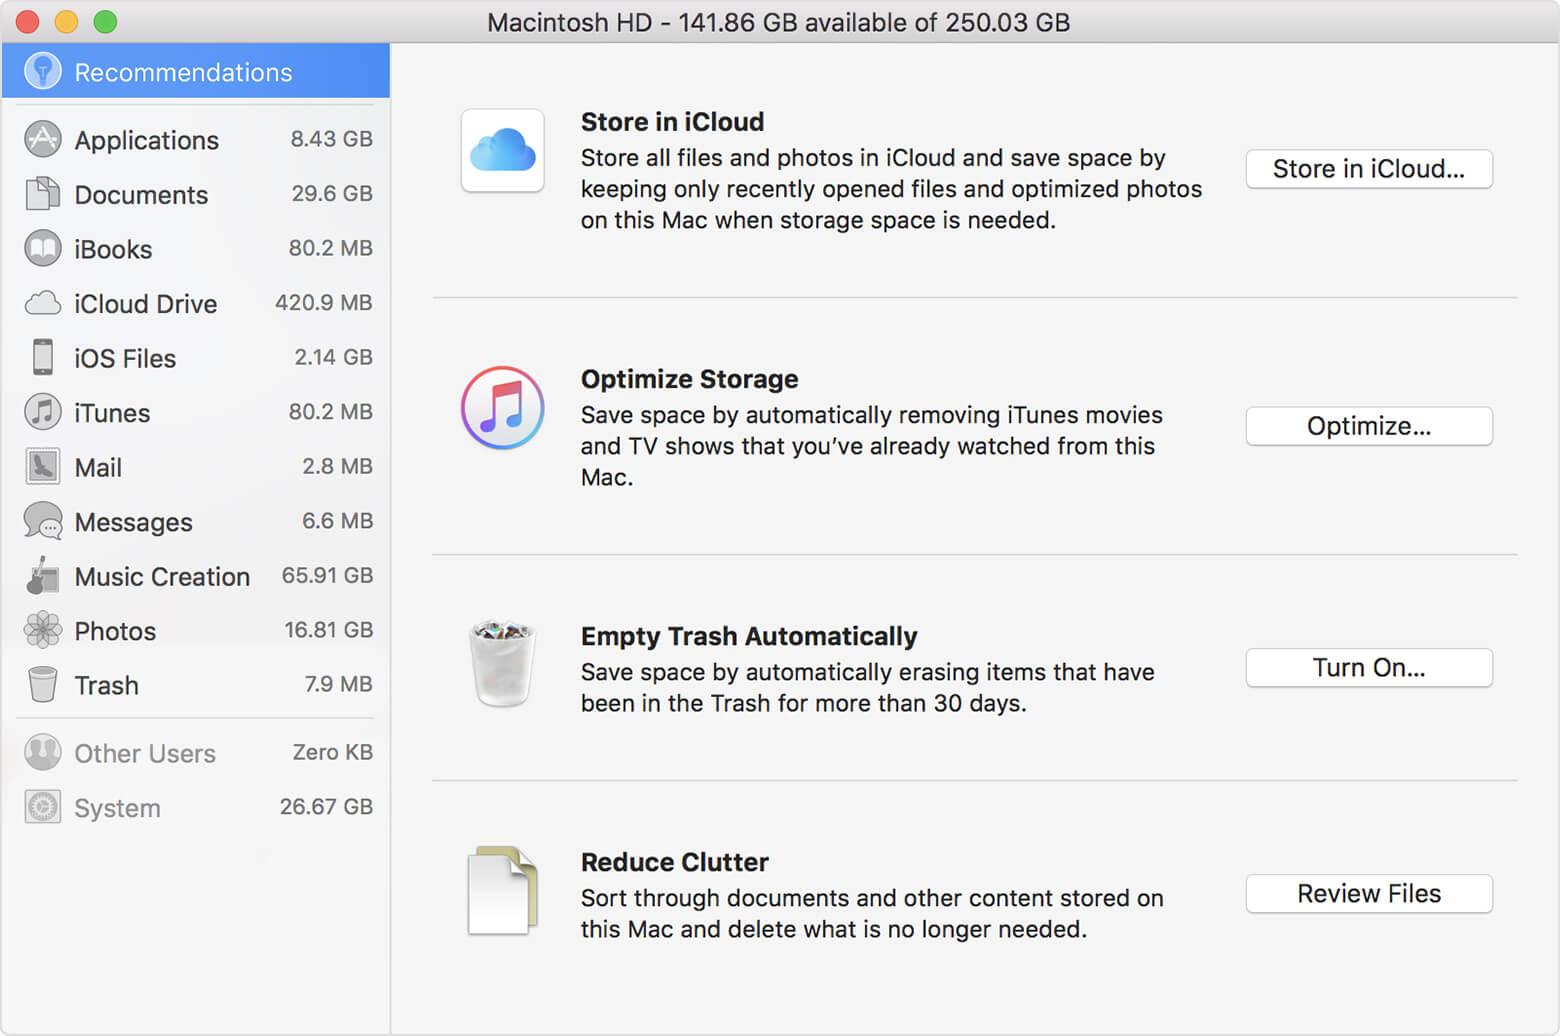 Macでサイズの大きなファイルを見つけるには、Reduce Clutterでファイルを確認します